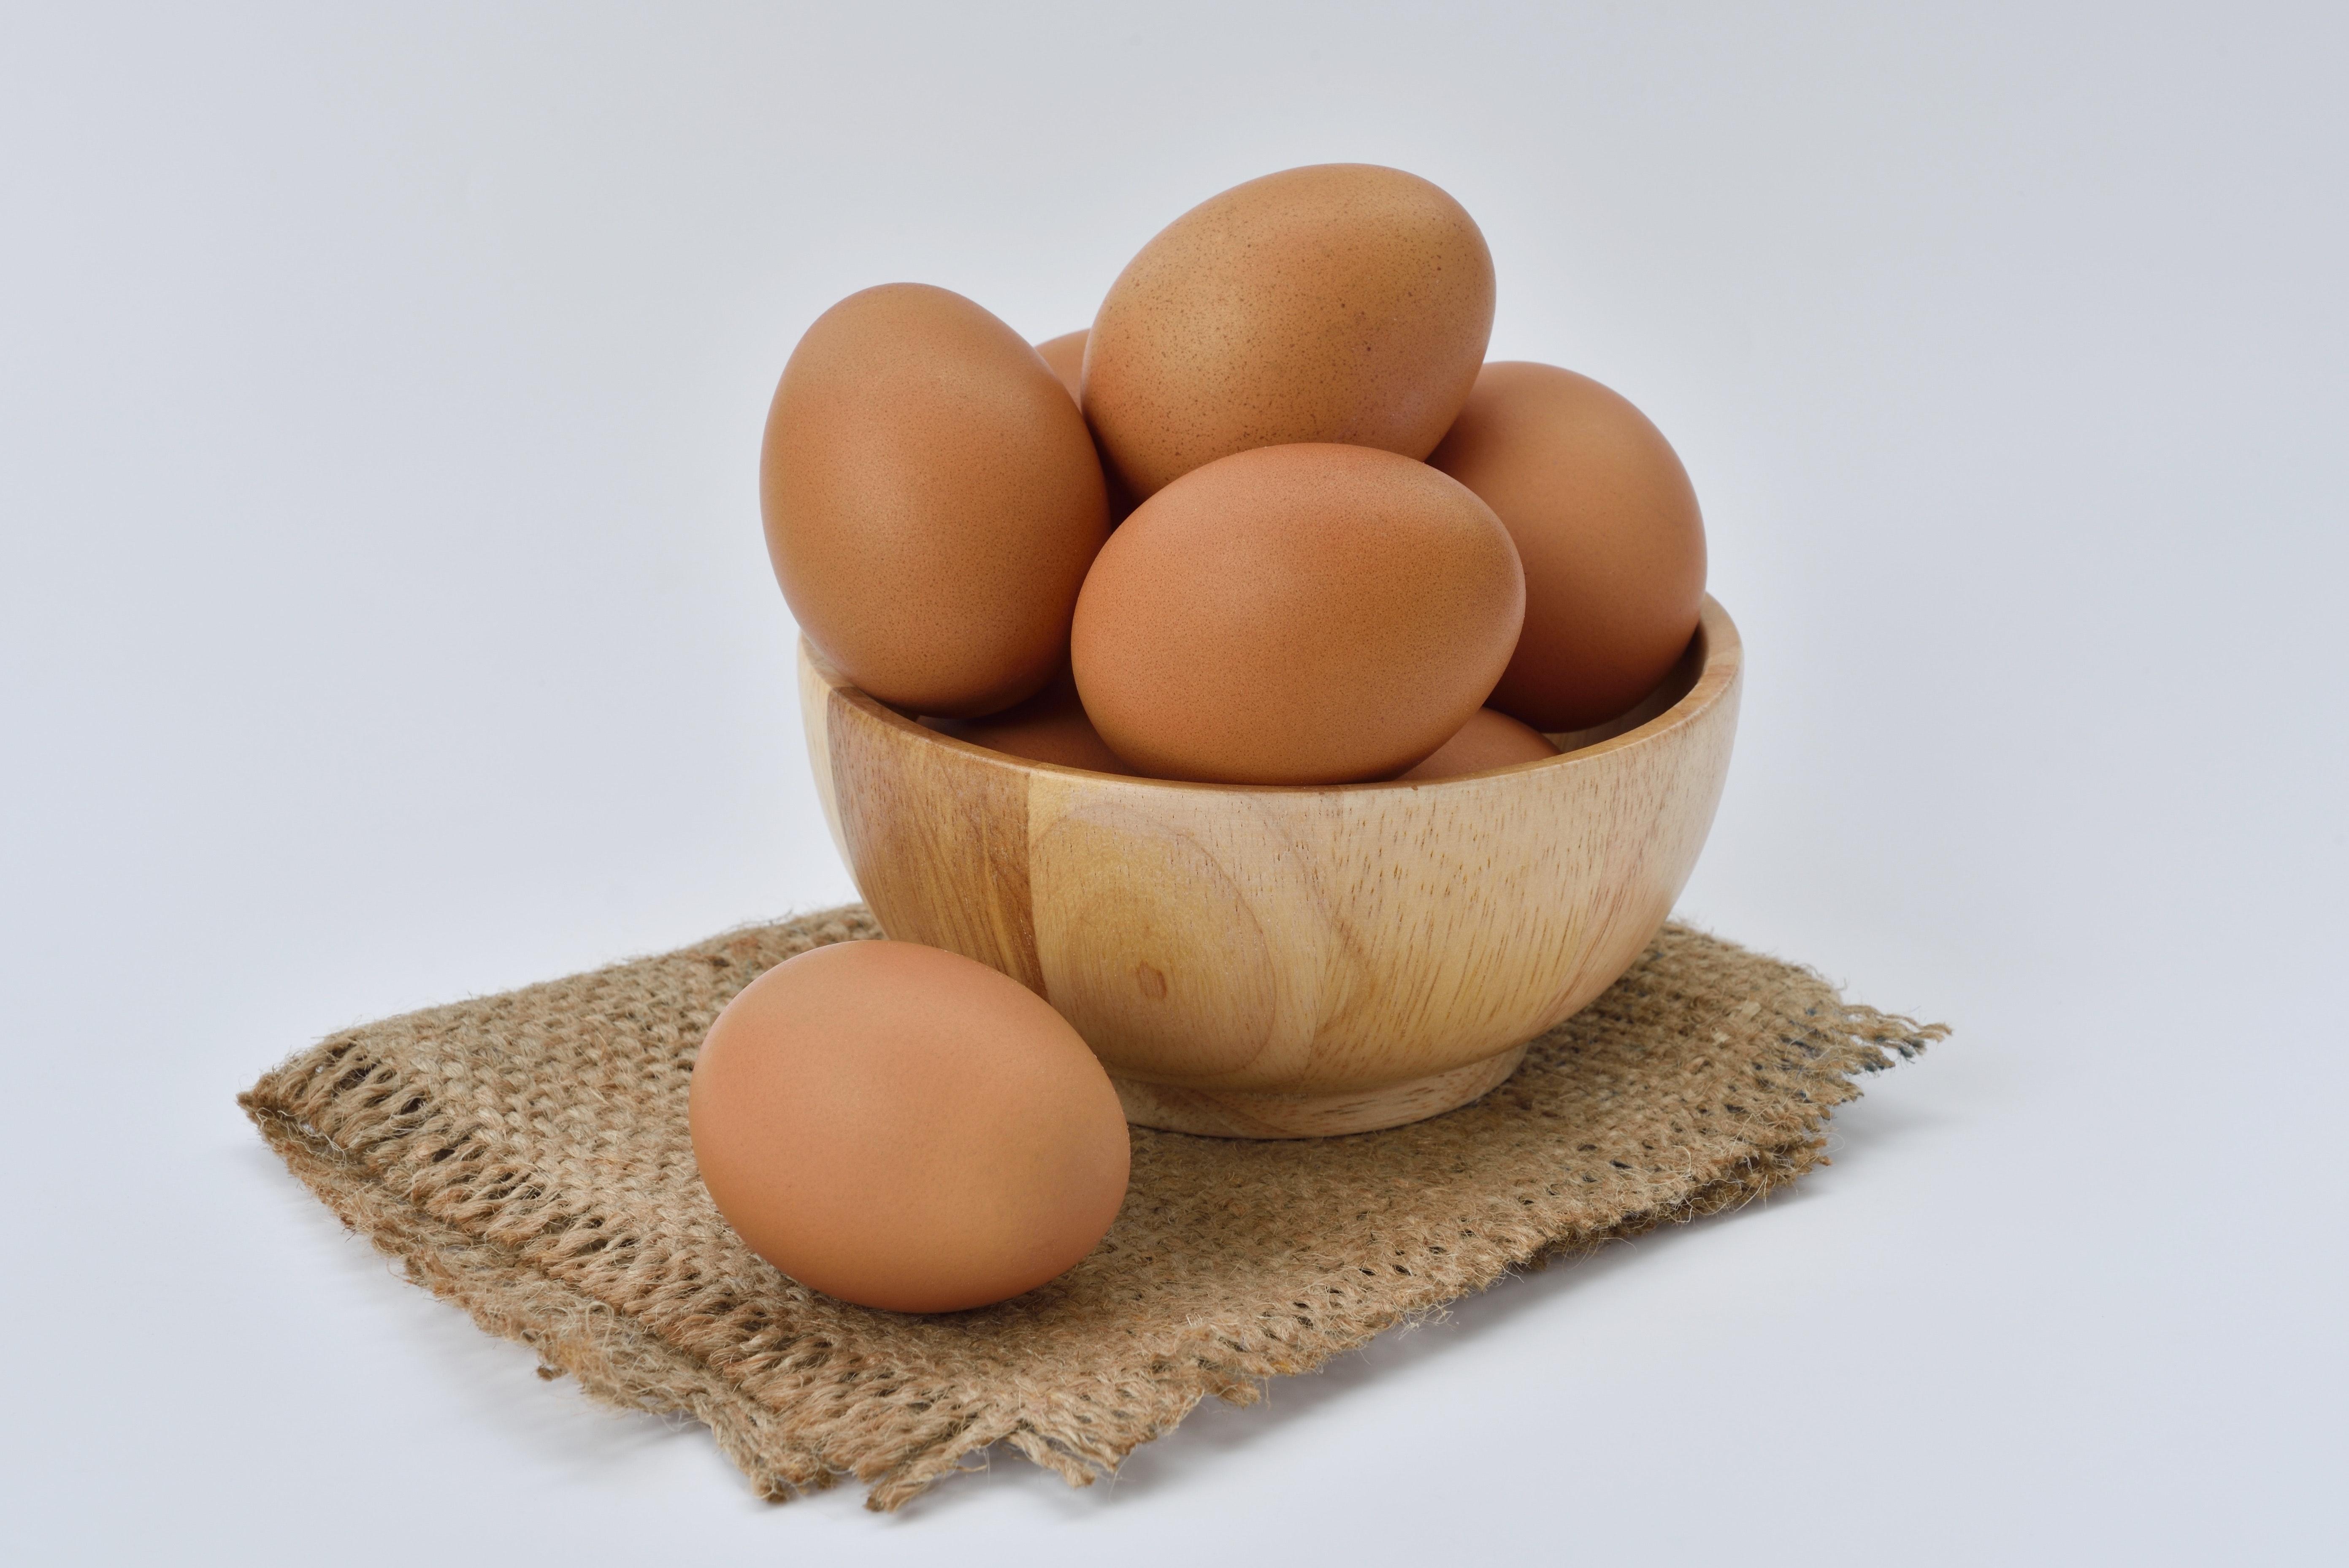 Eggs KreedOn Healthy Foods to gain weight